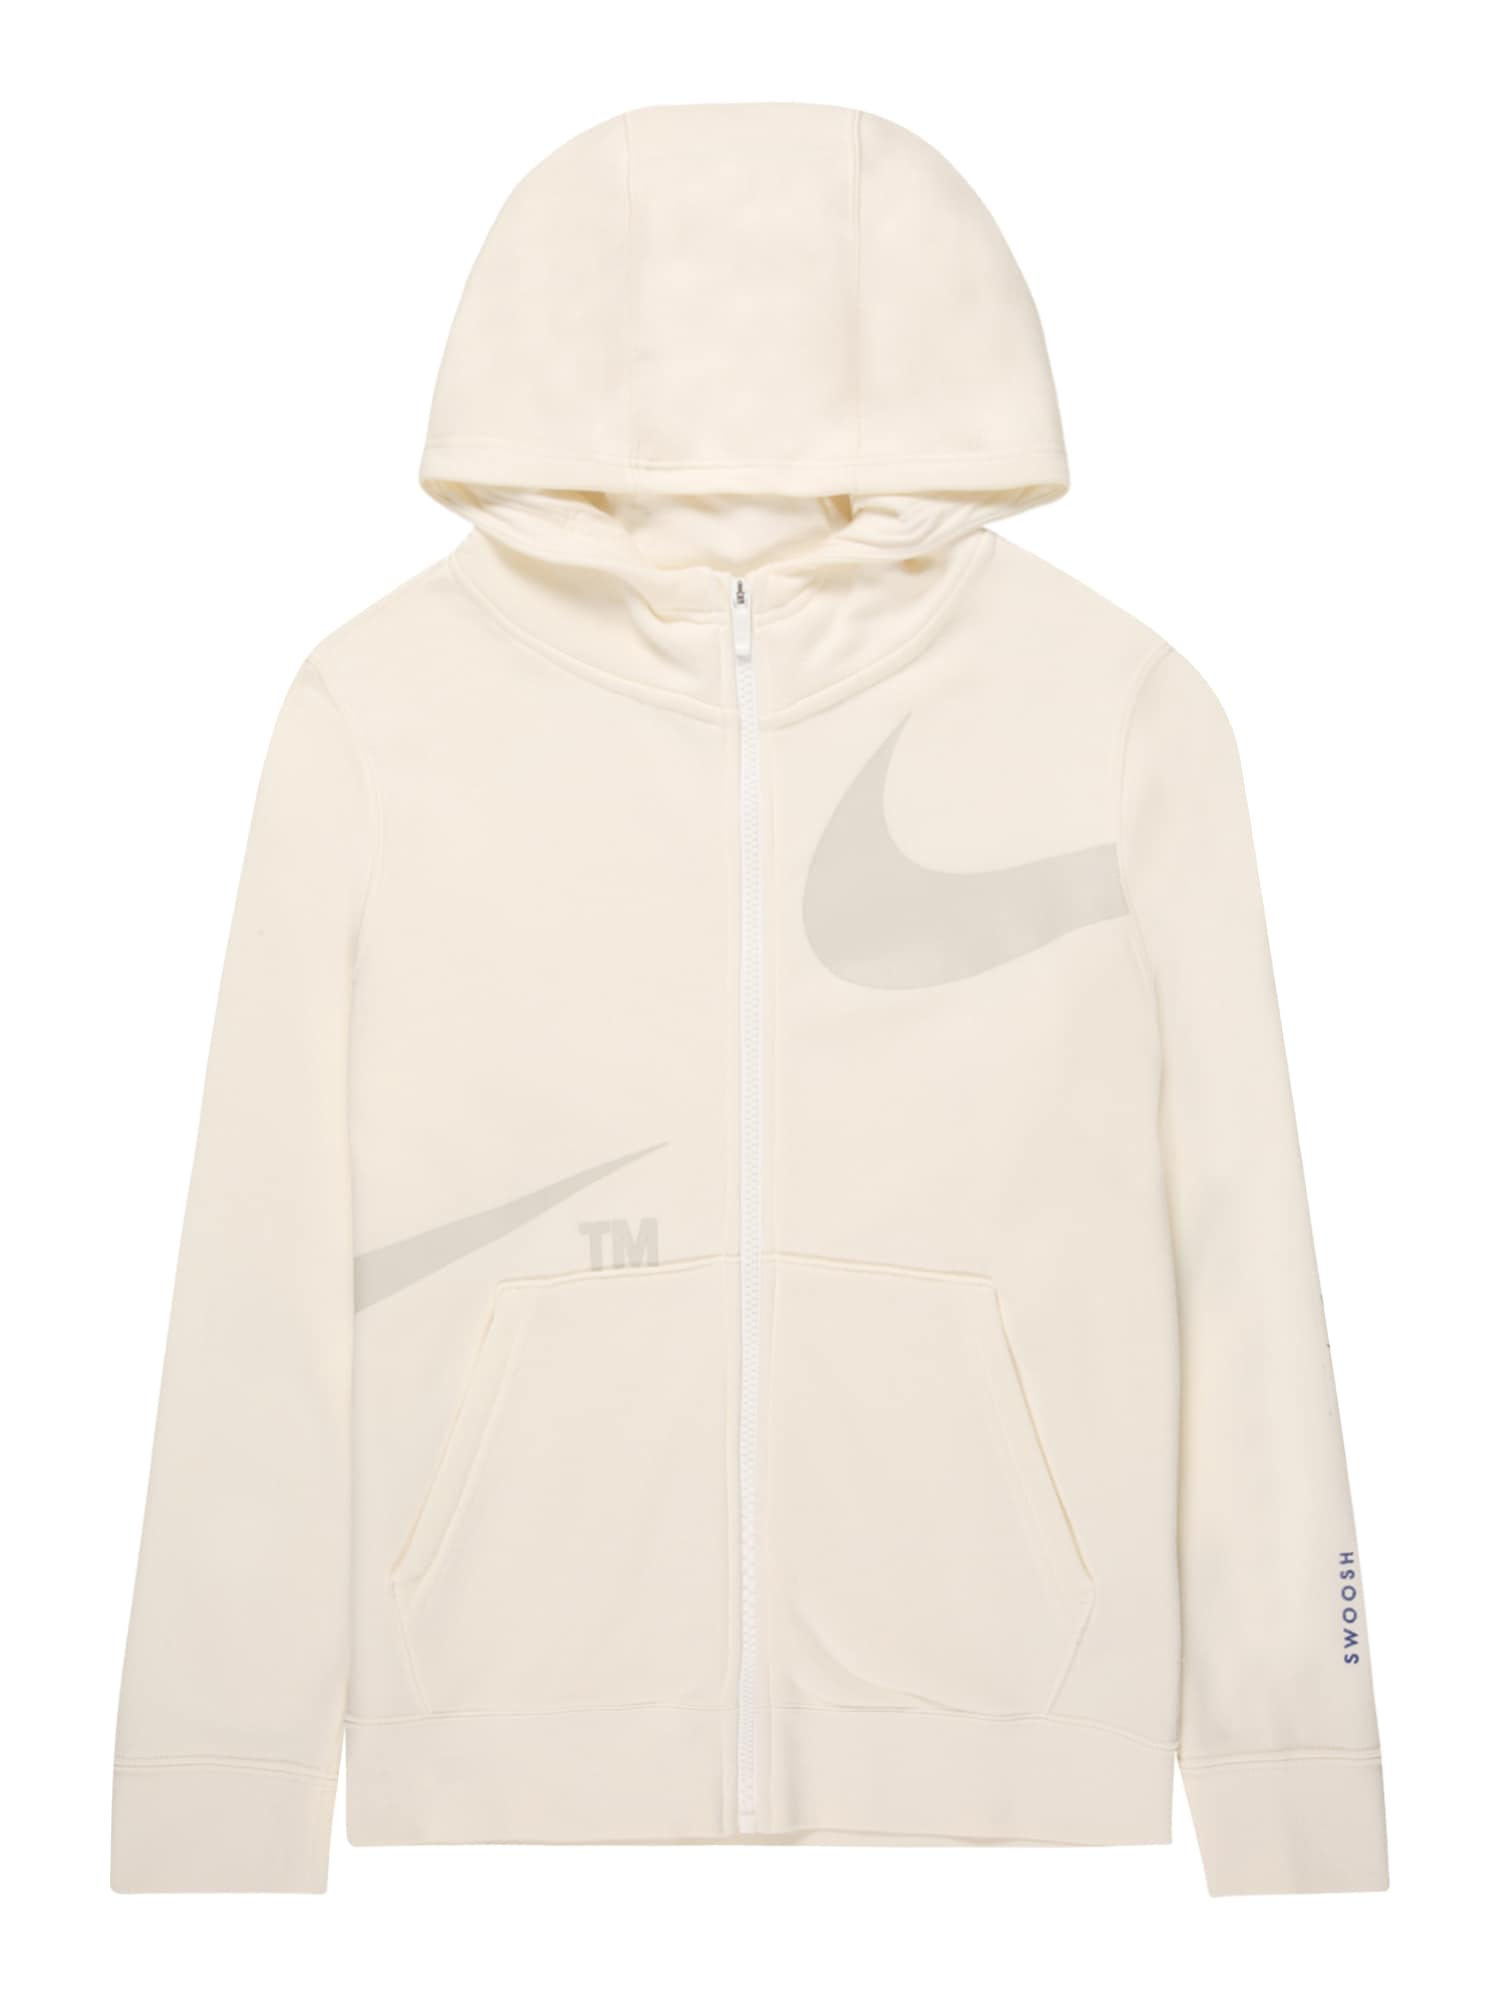 Nike Sportswear Džemperis gelsvai pilka spalva / balta